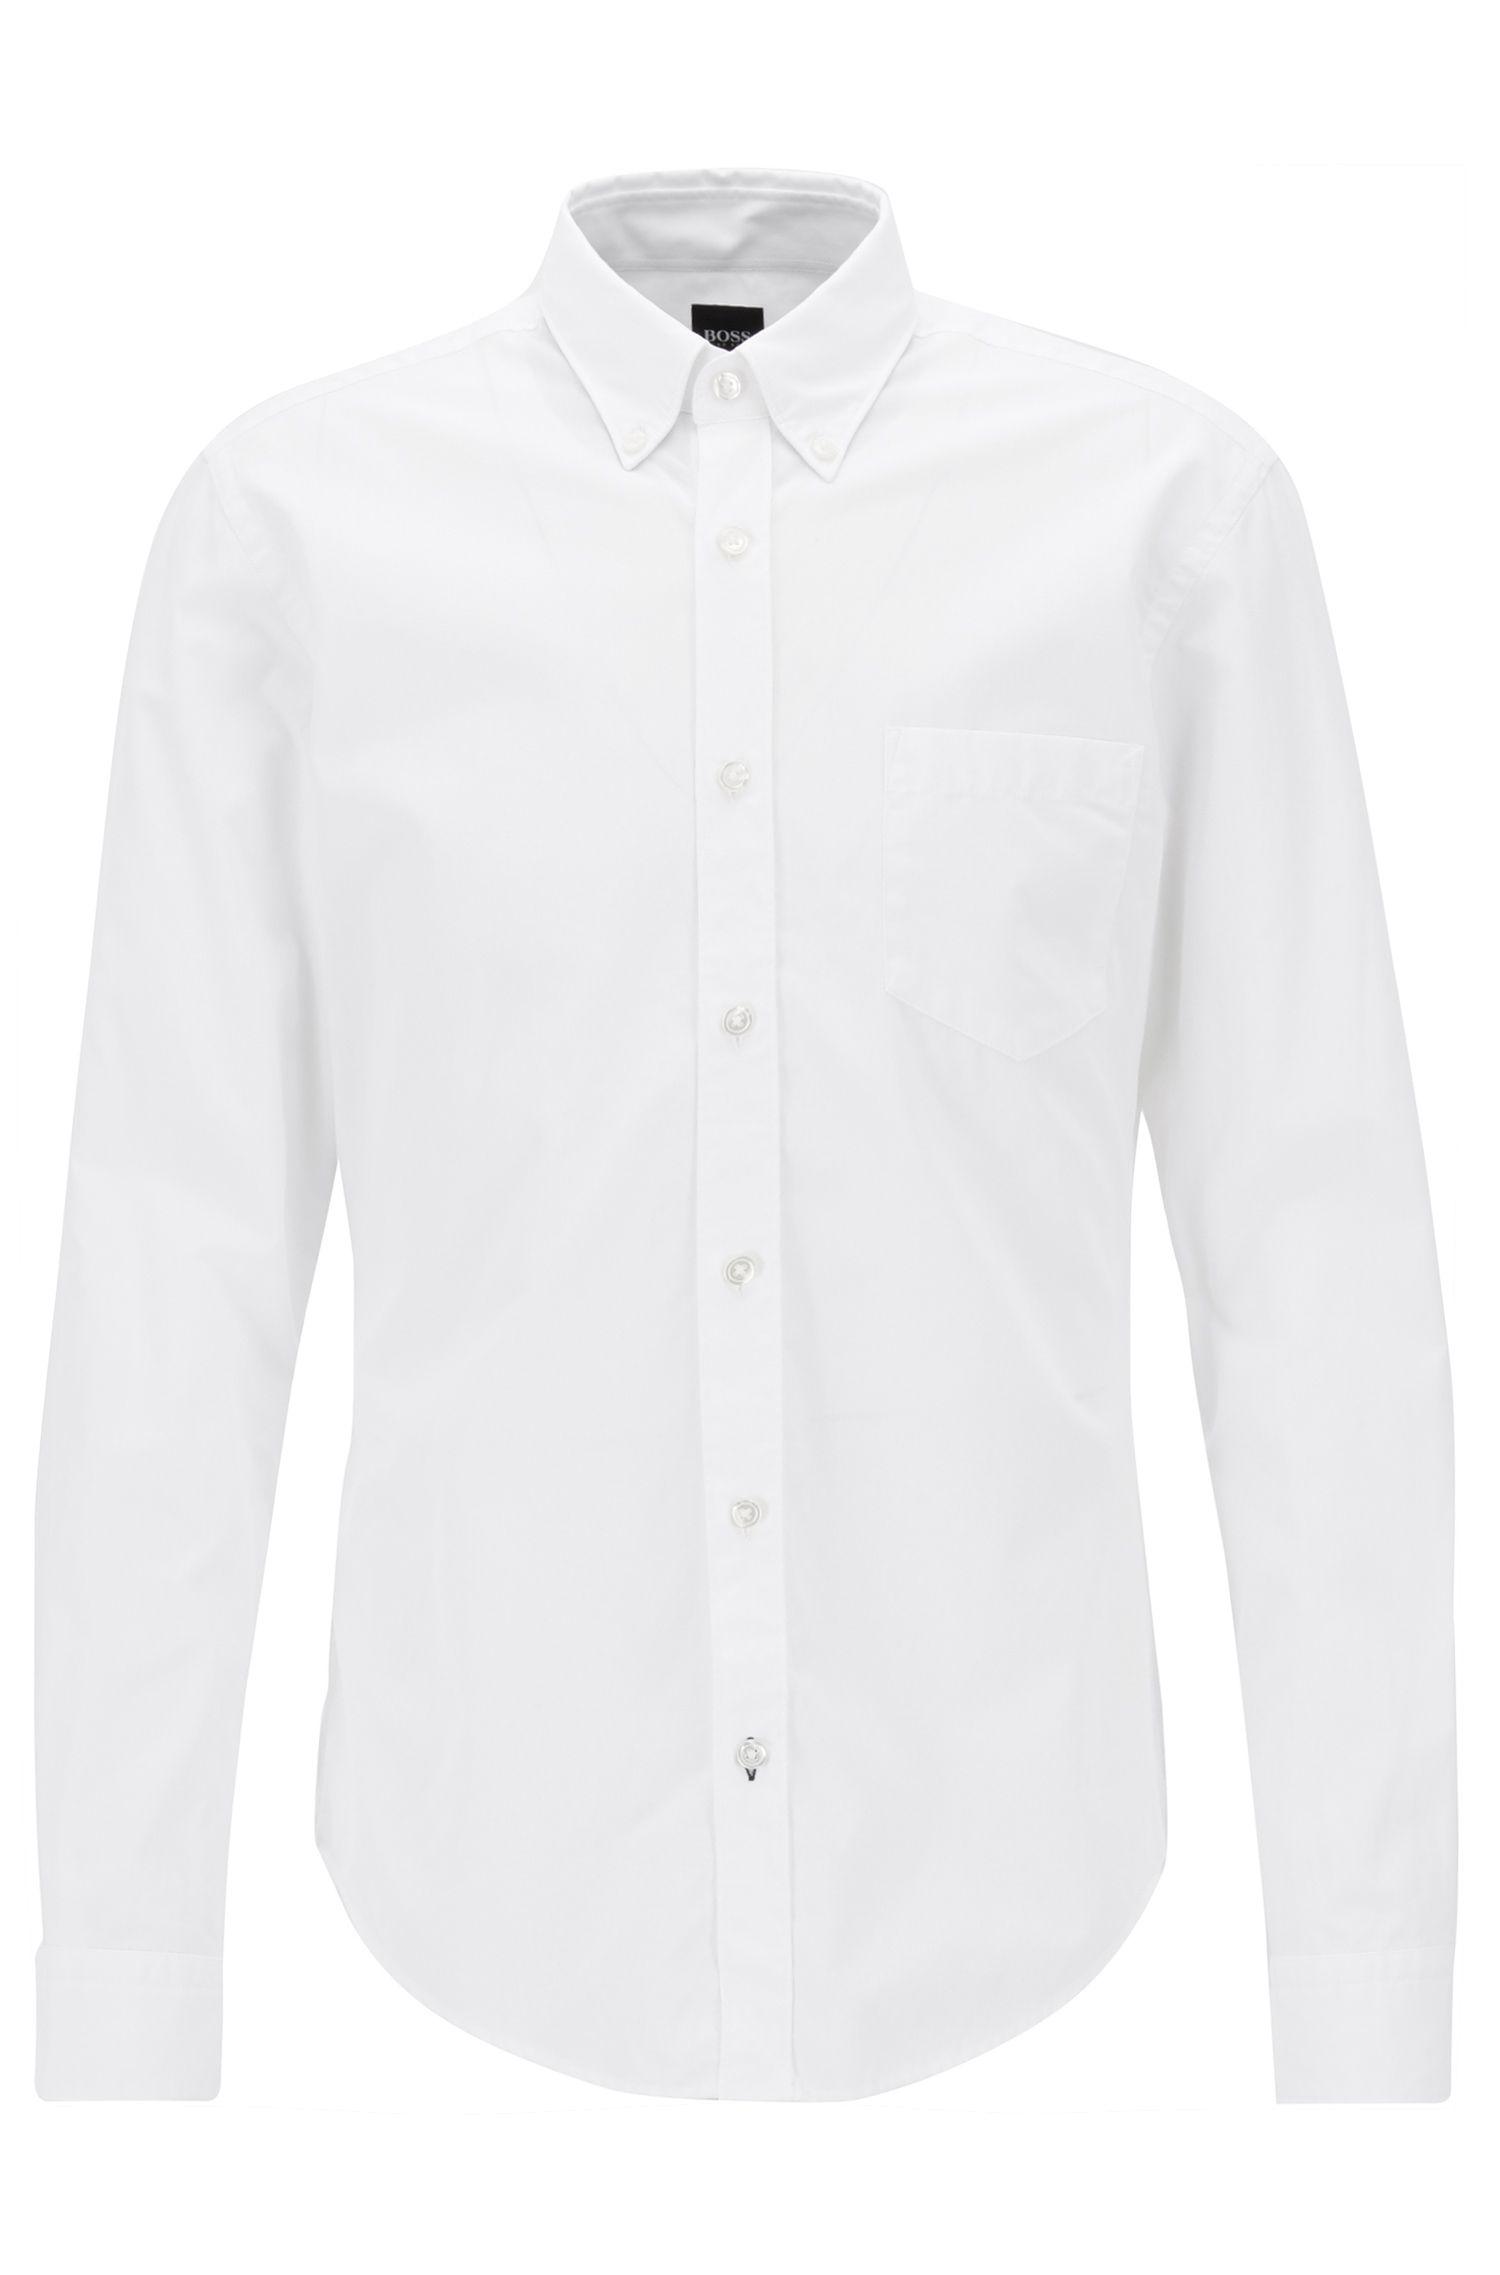 Garment Washed End on End Cotton Dress Shirt, Slim Fit | Rod P